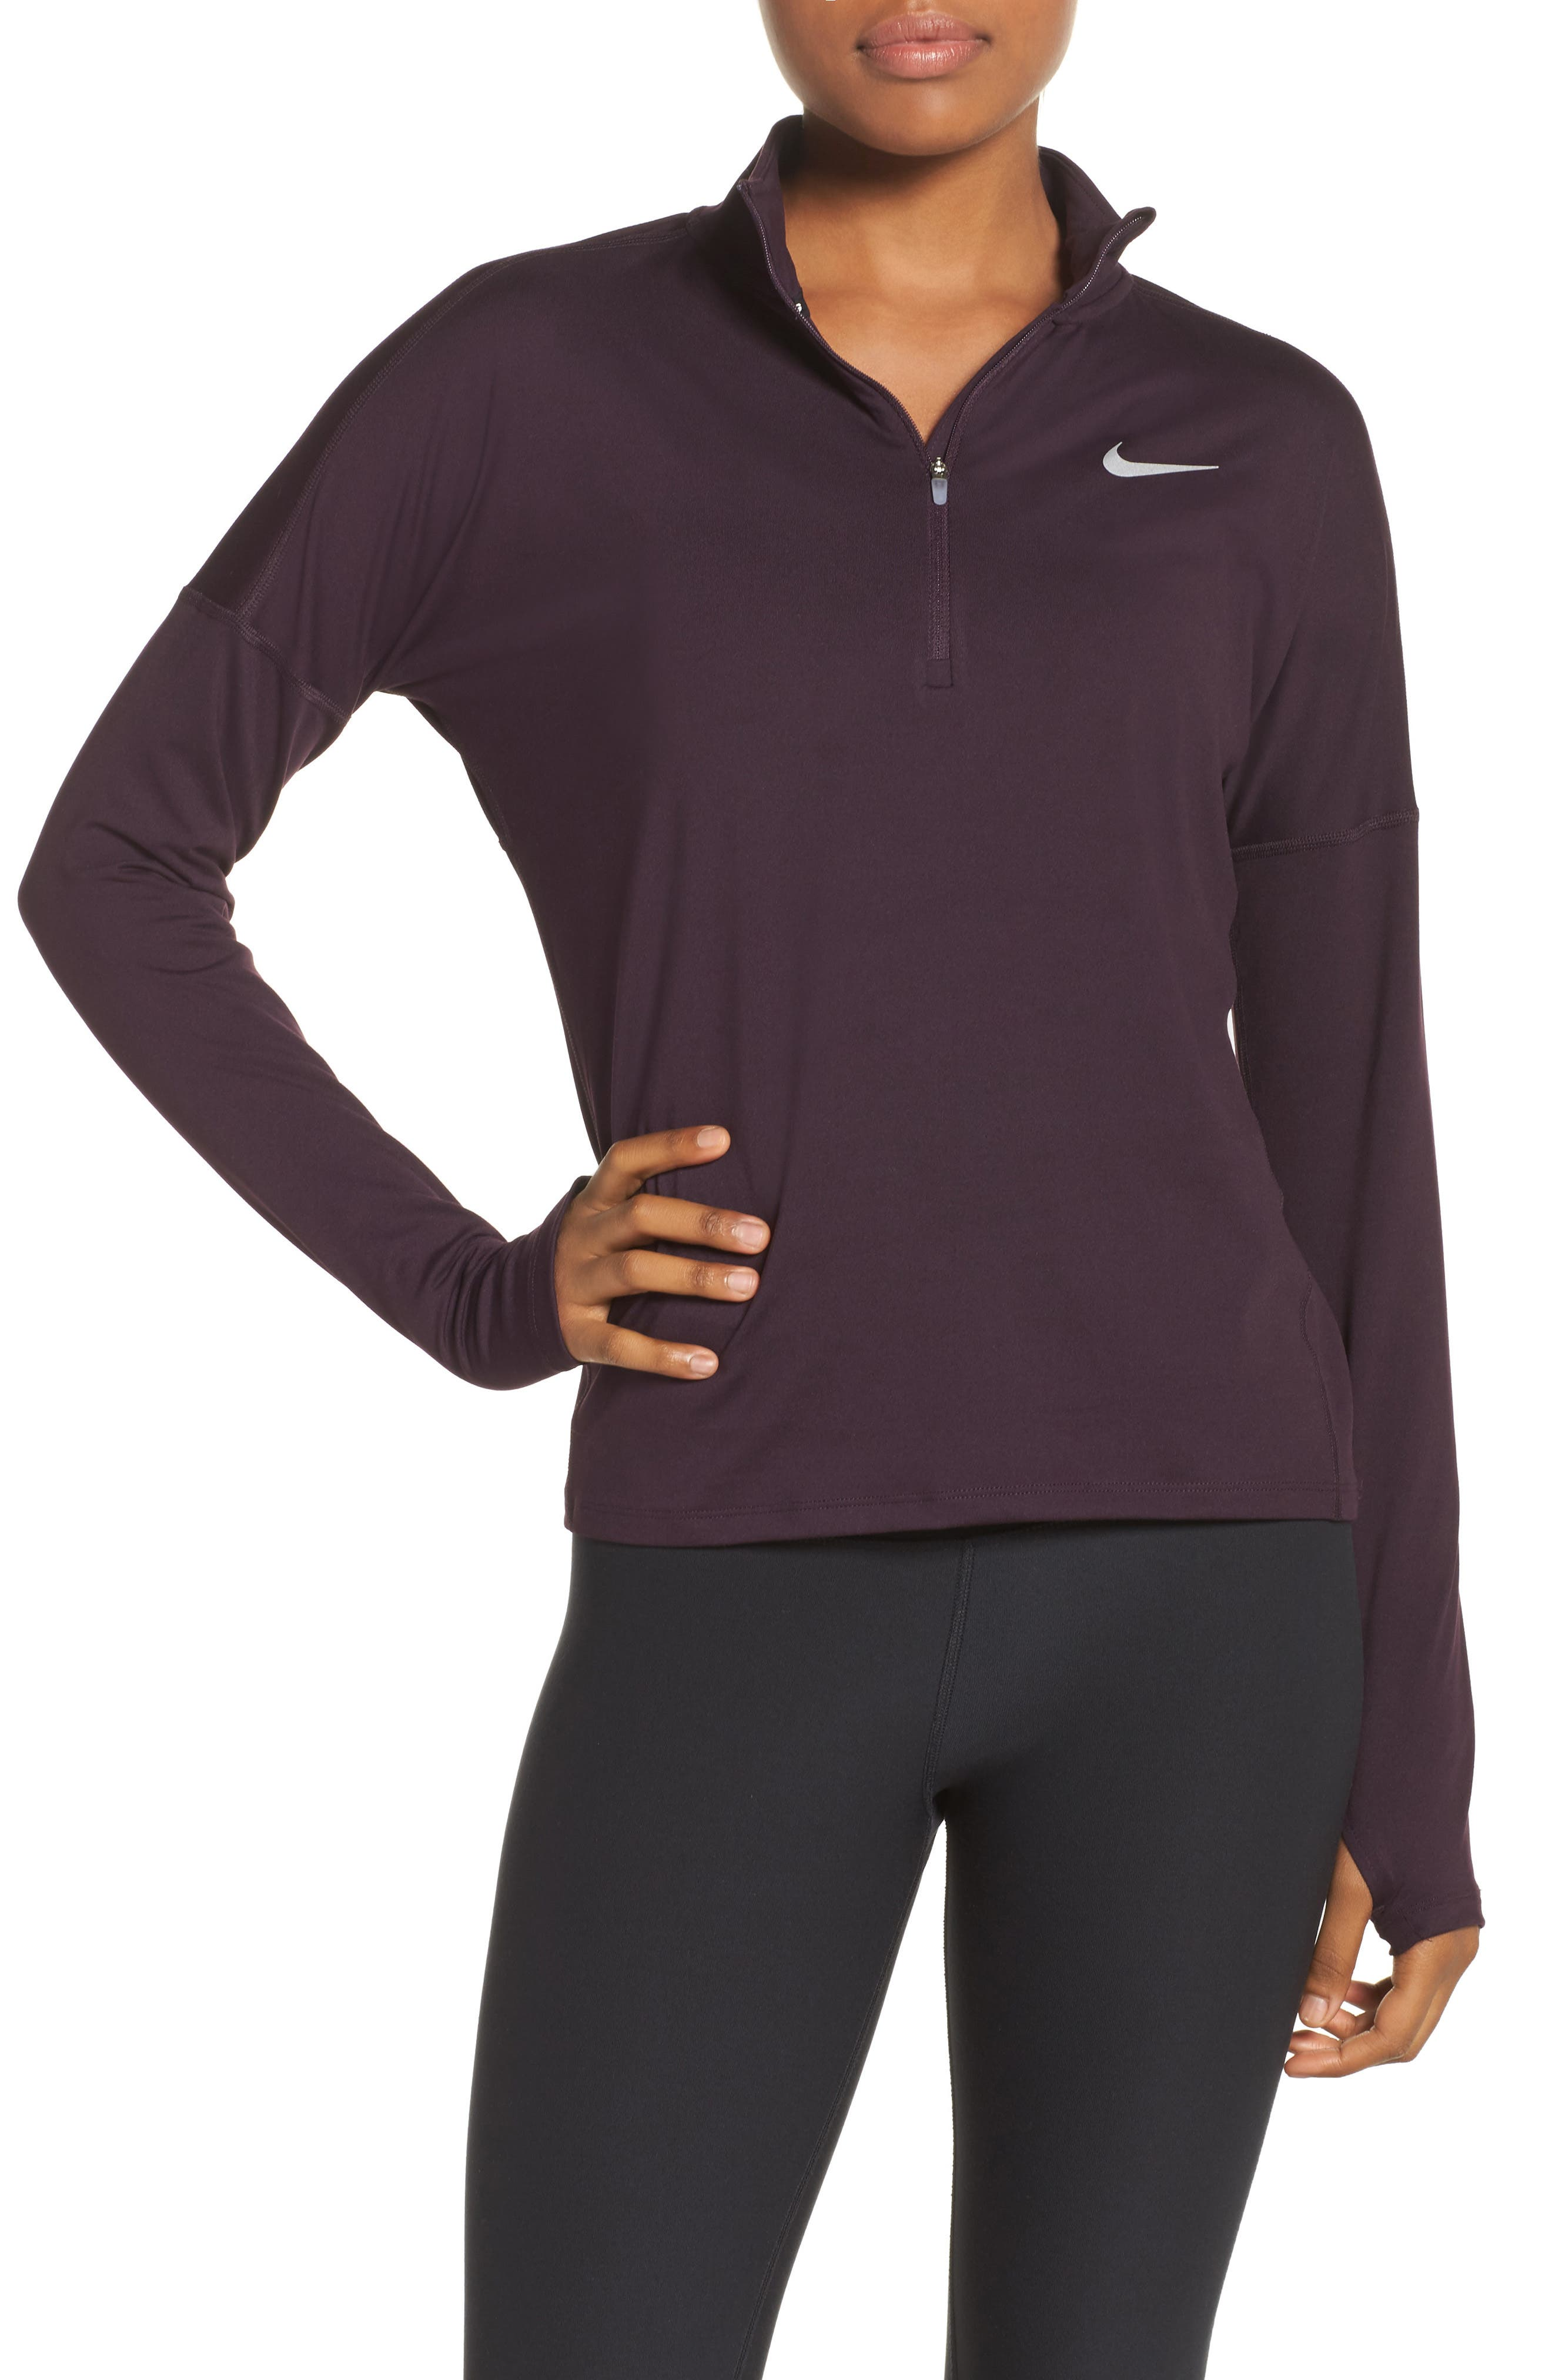 Alternate Image 1 Selected - Nike Dry Element Half Zip Top